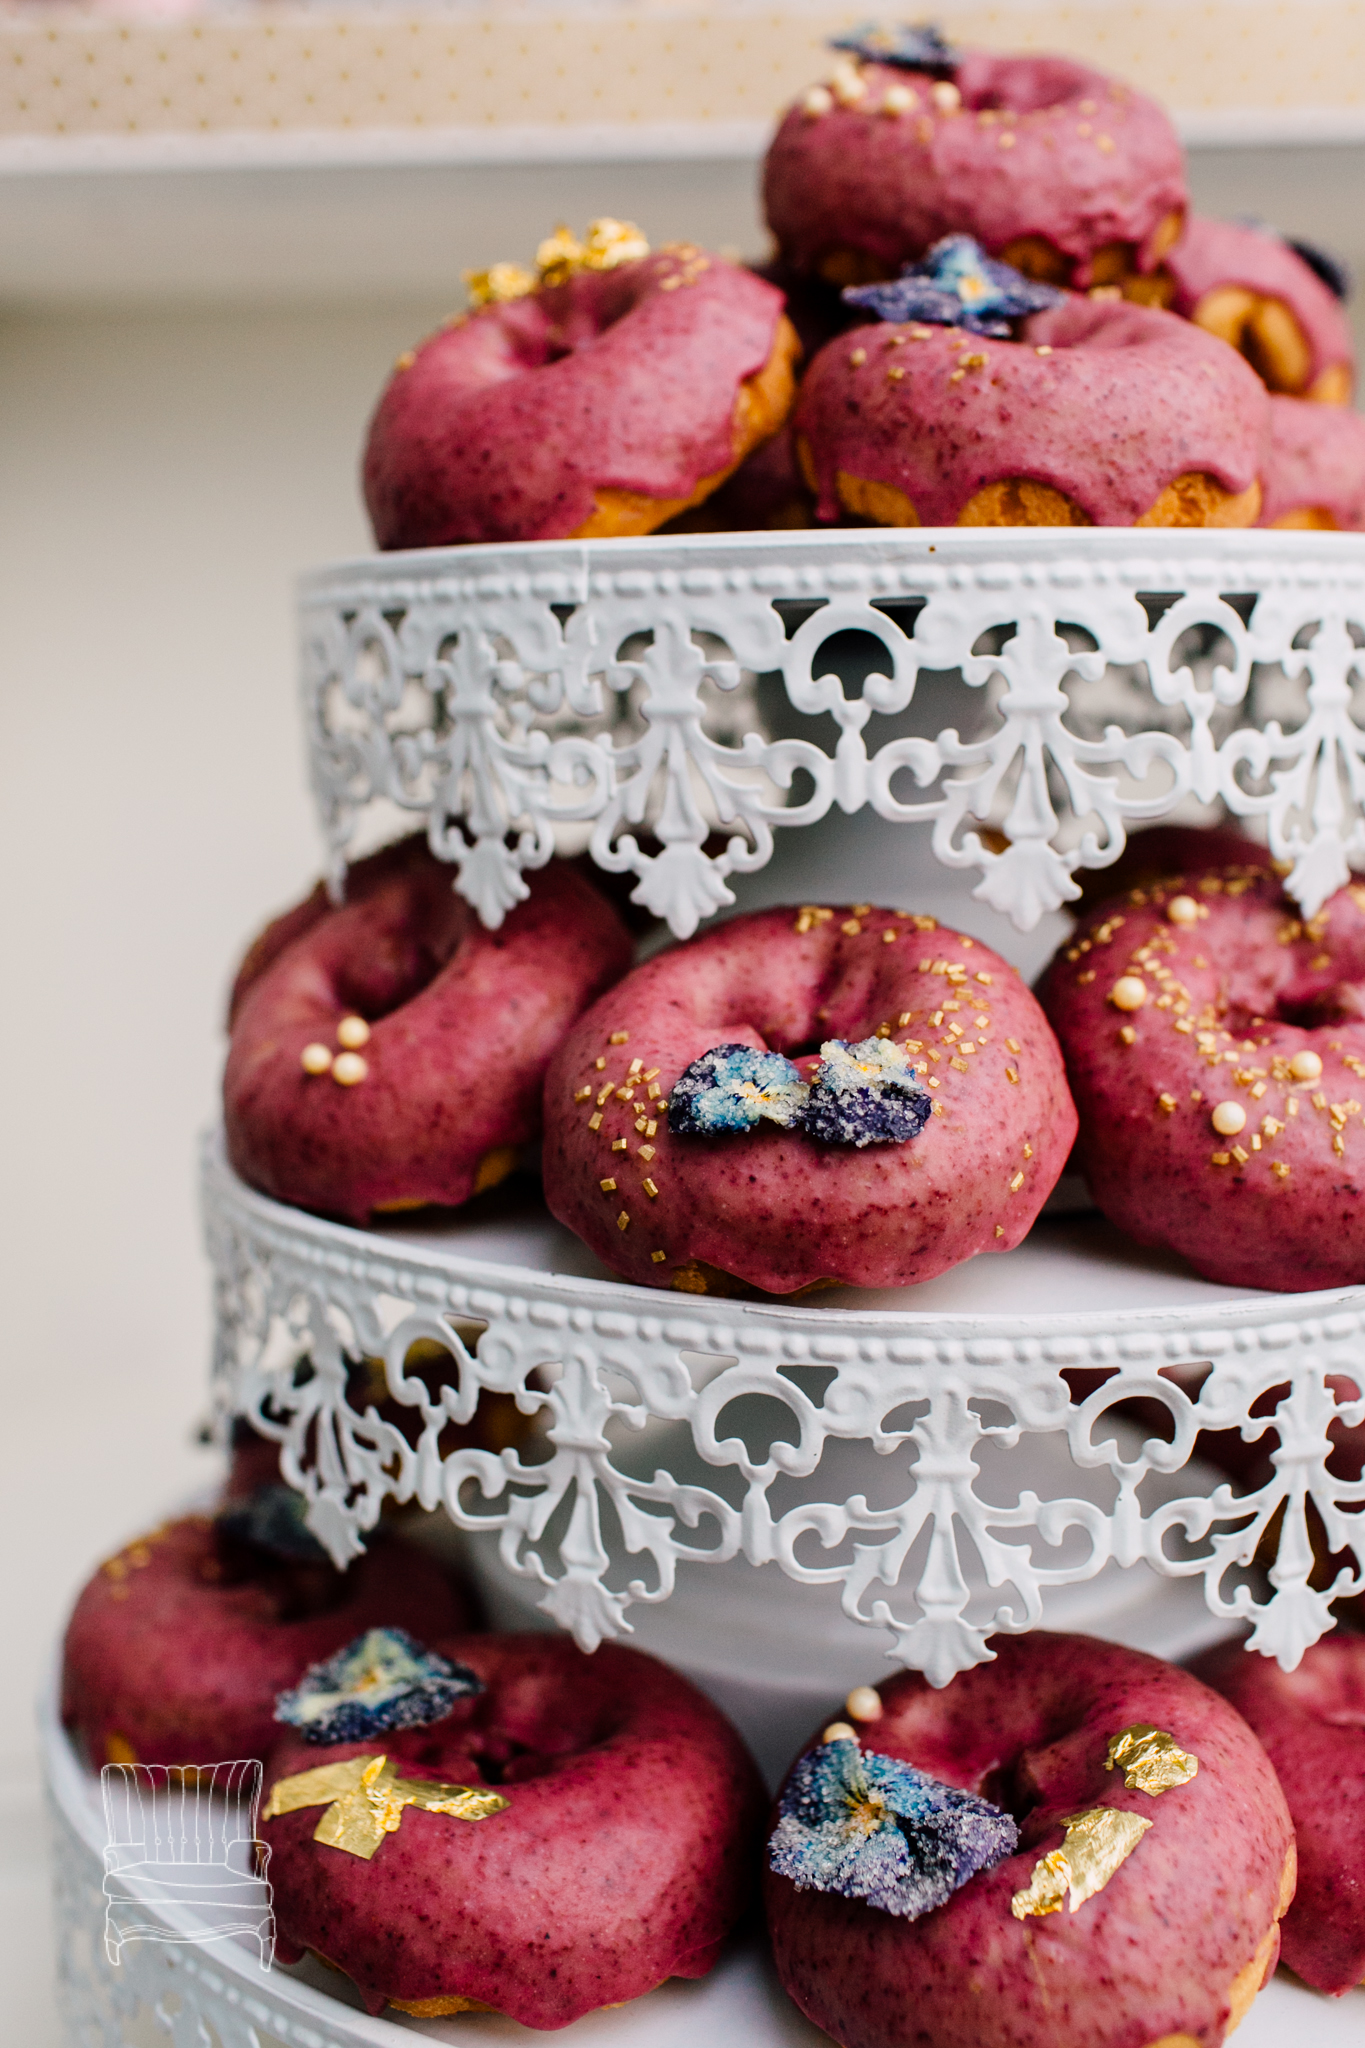 bellwether-bellingham-wedding-styled-katheryn-moran-photography-3-2.jpg